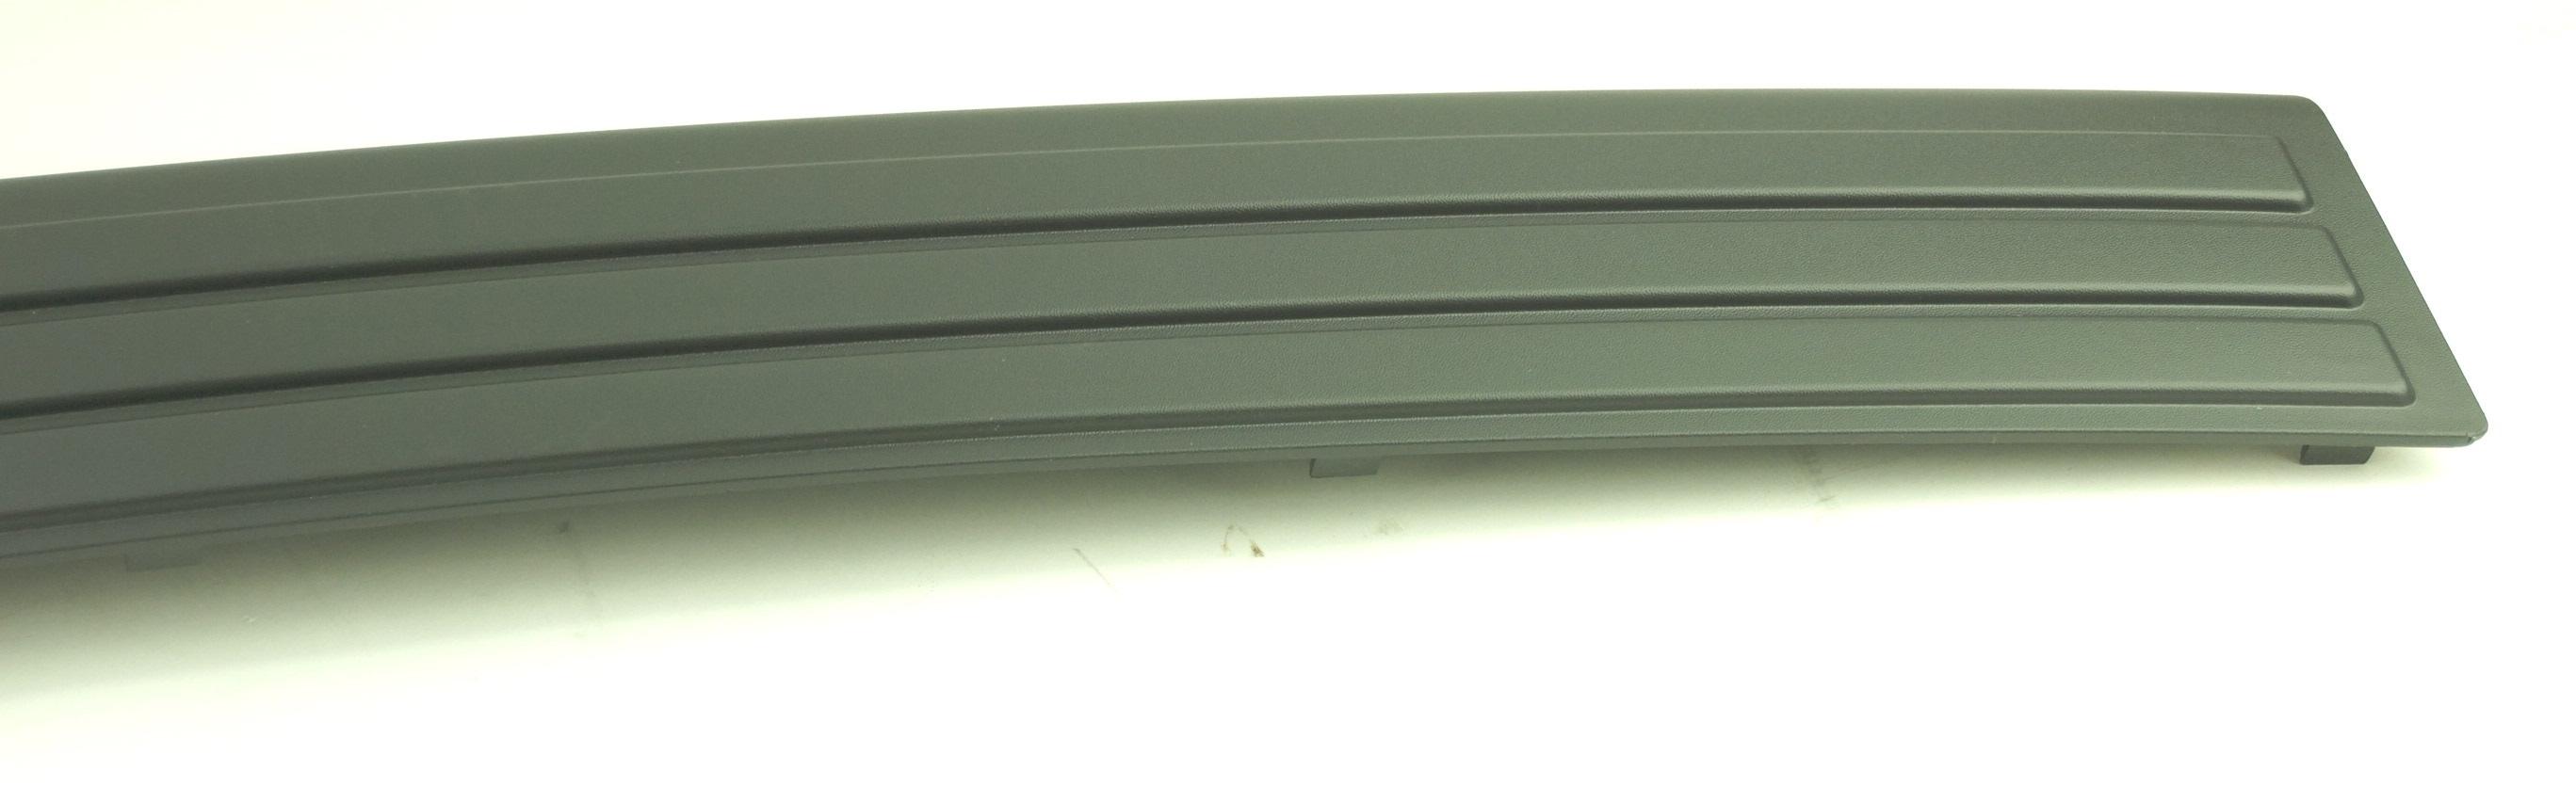 New OEM 68091515-AA Genuine Mopar Rear Fascia Bumper Step Pad Fast Free Shipping - image 4